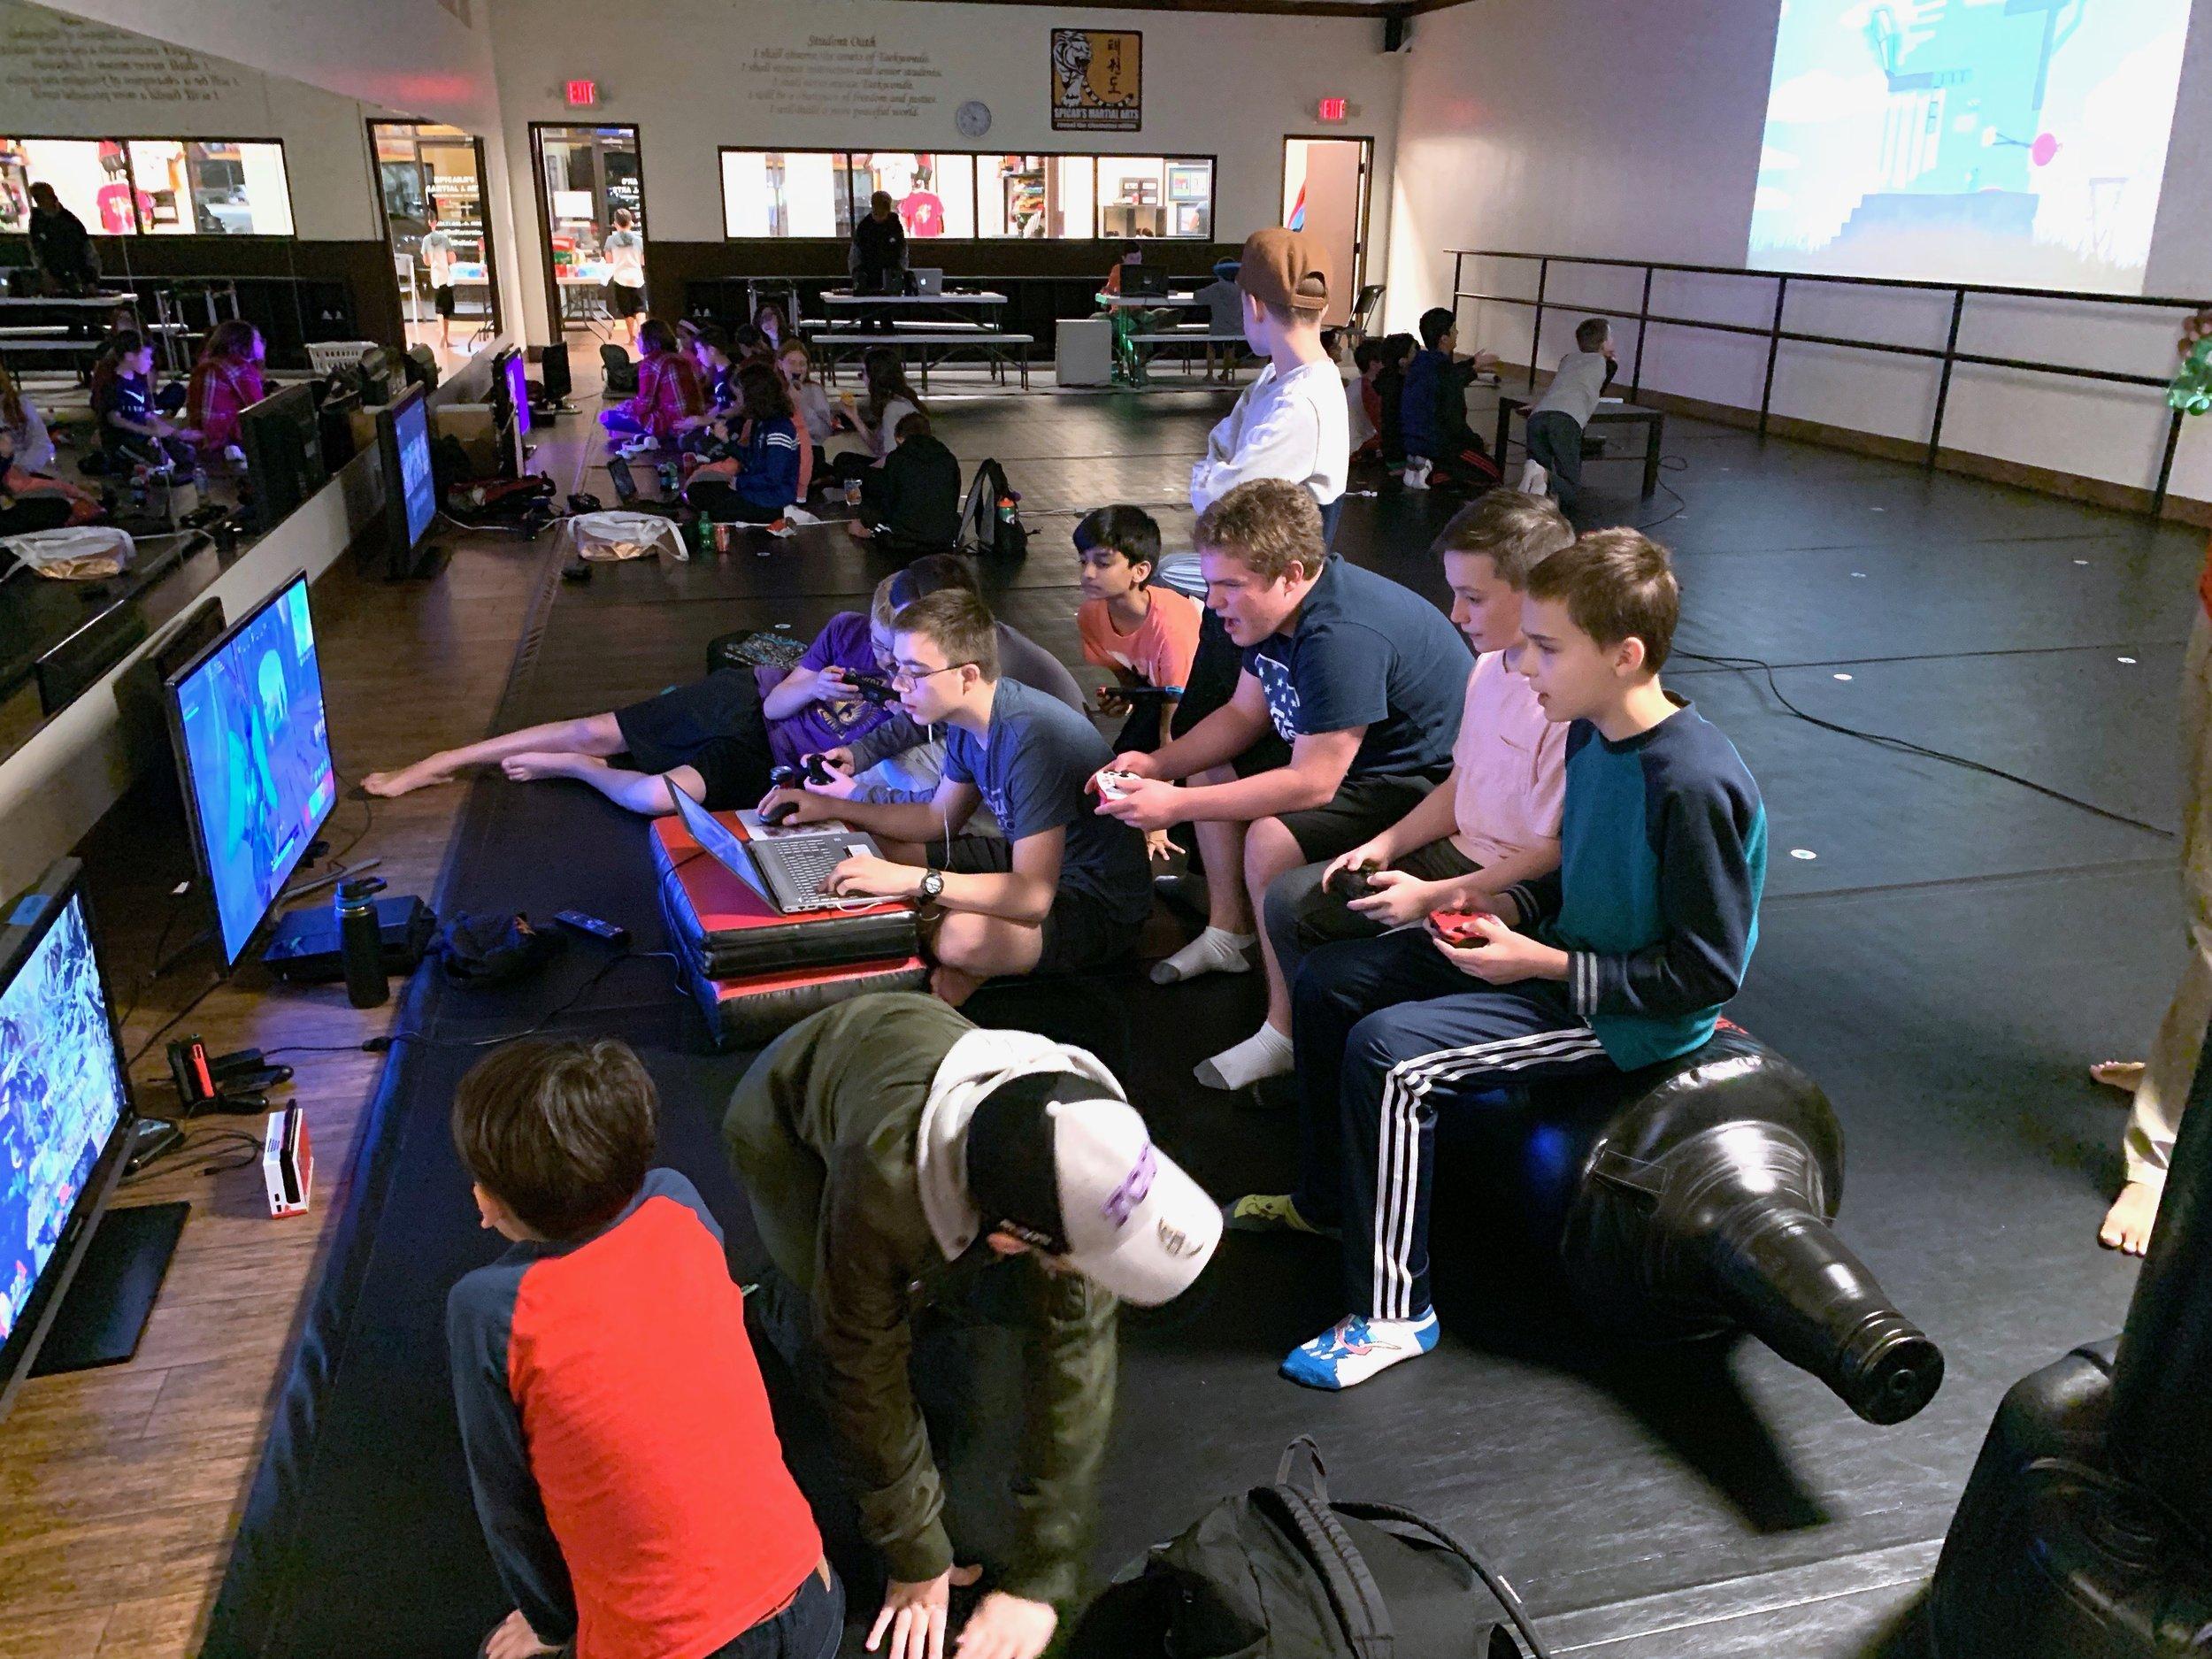 kids-teens-video-game-party-southlake-texas.jpeg